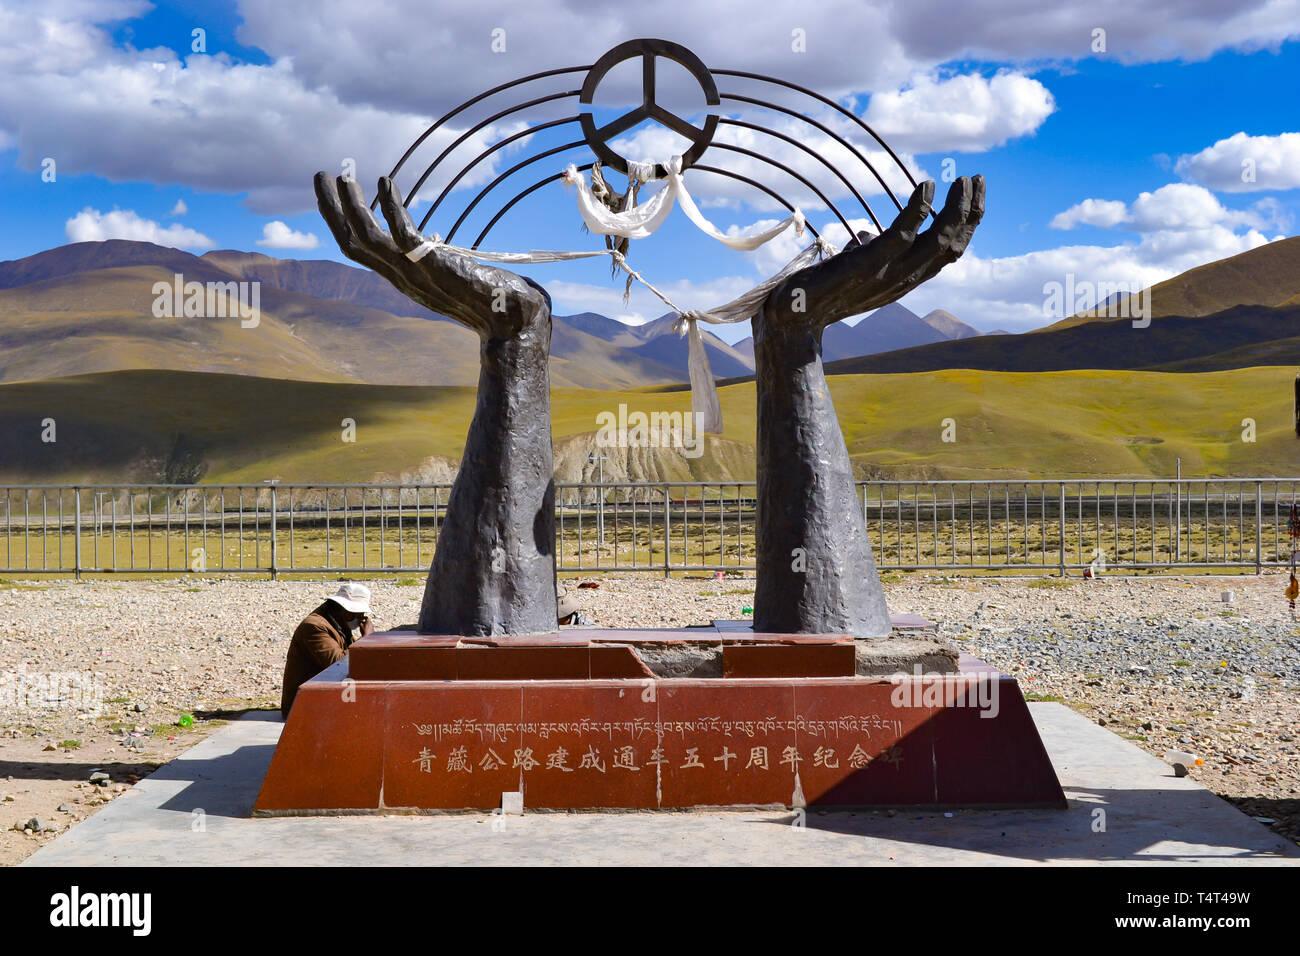 The monument of Qinghai–Tibet railway, a high-elevation railway on Tibetan Plateau in Tibet, China - Stock Image